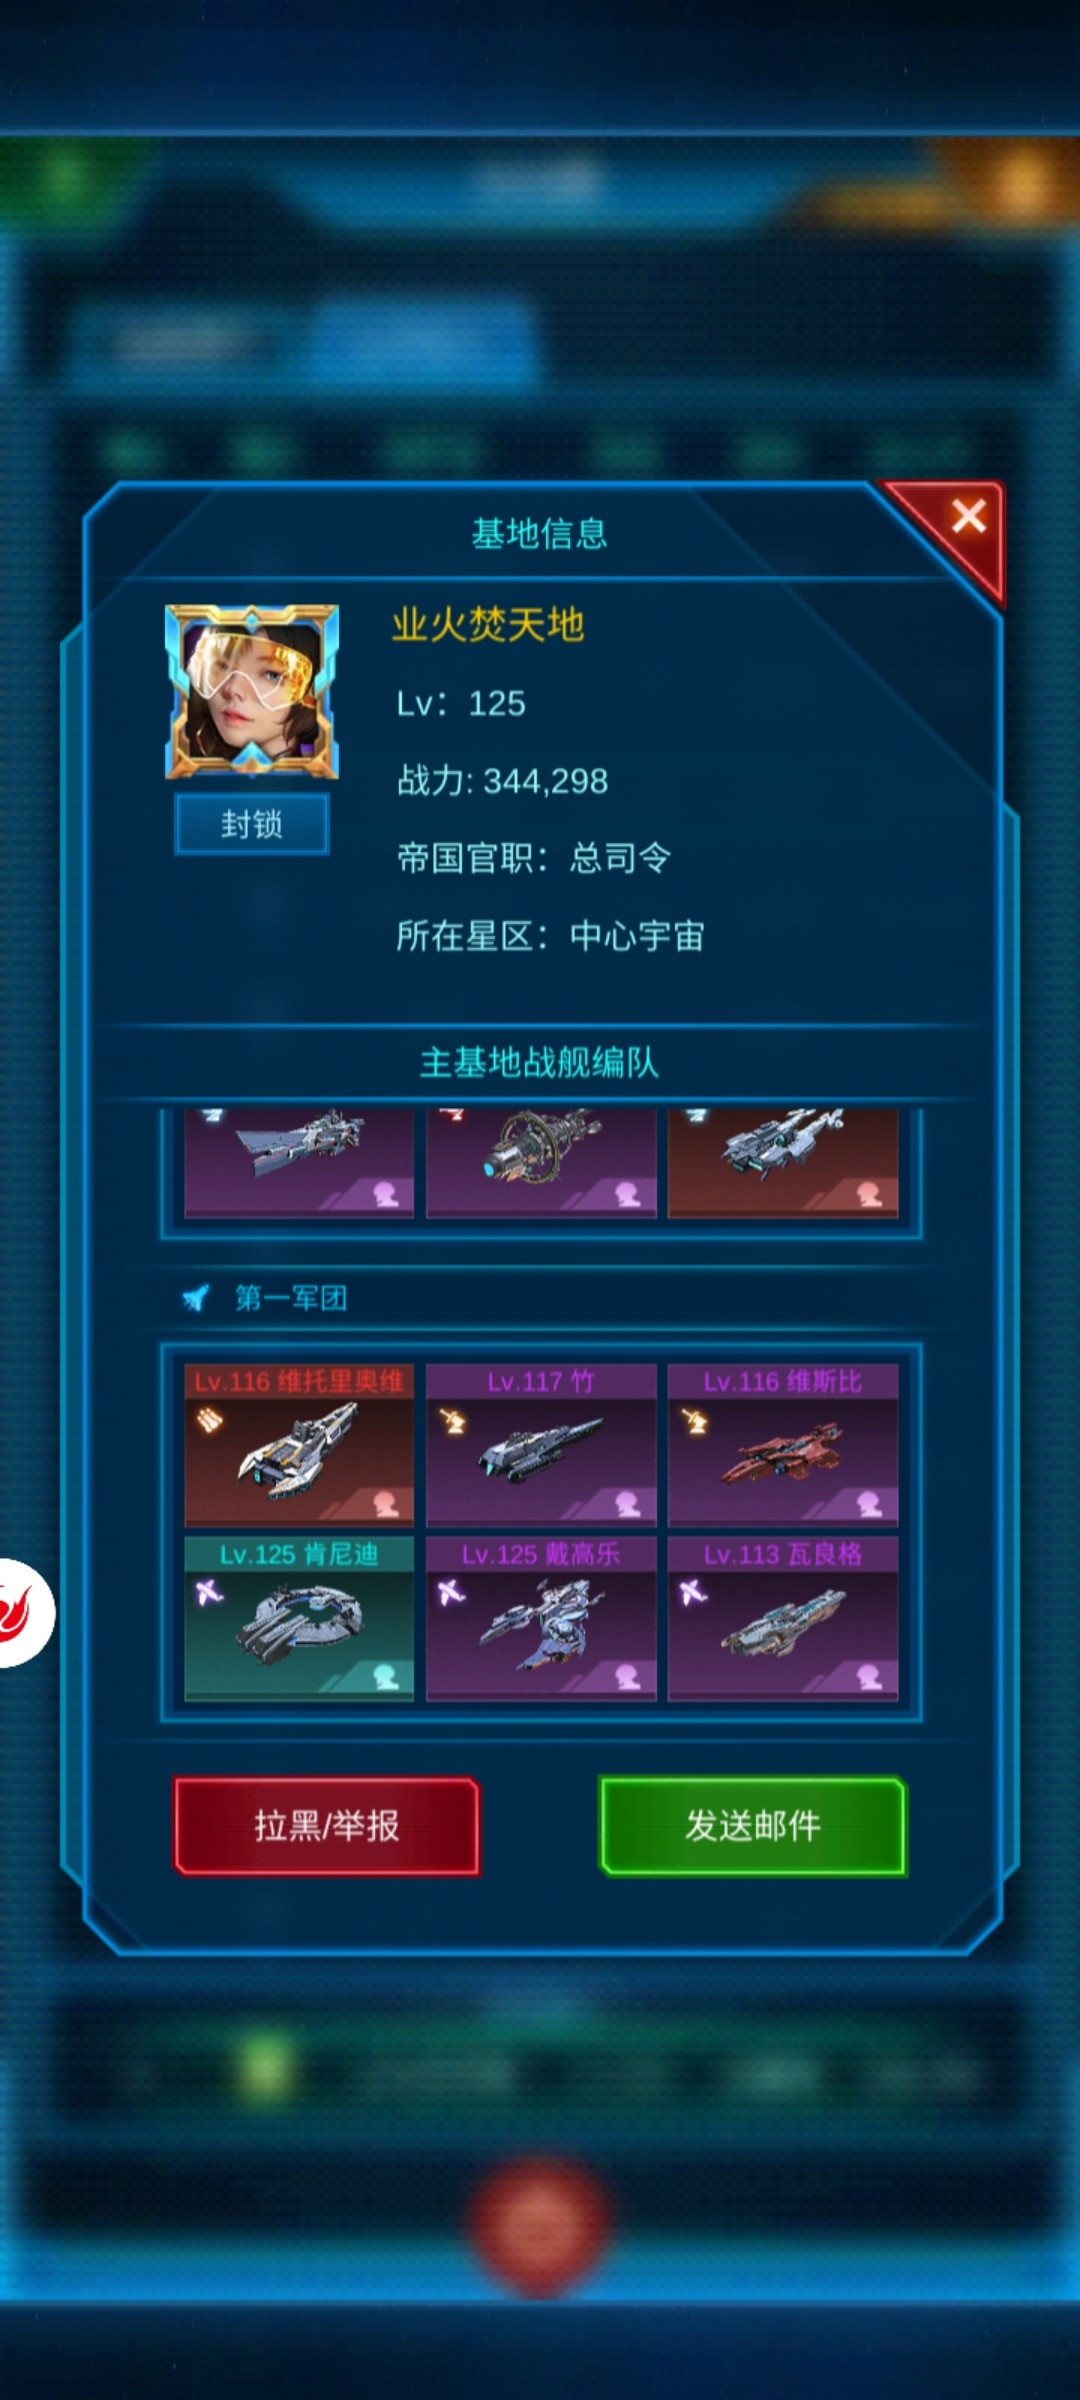 Screenshot_20210508_083958_com.jedigames.p16s.luobo.jpg